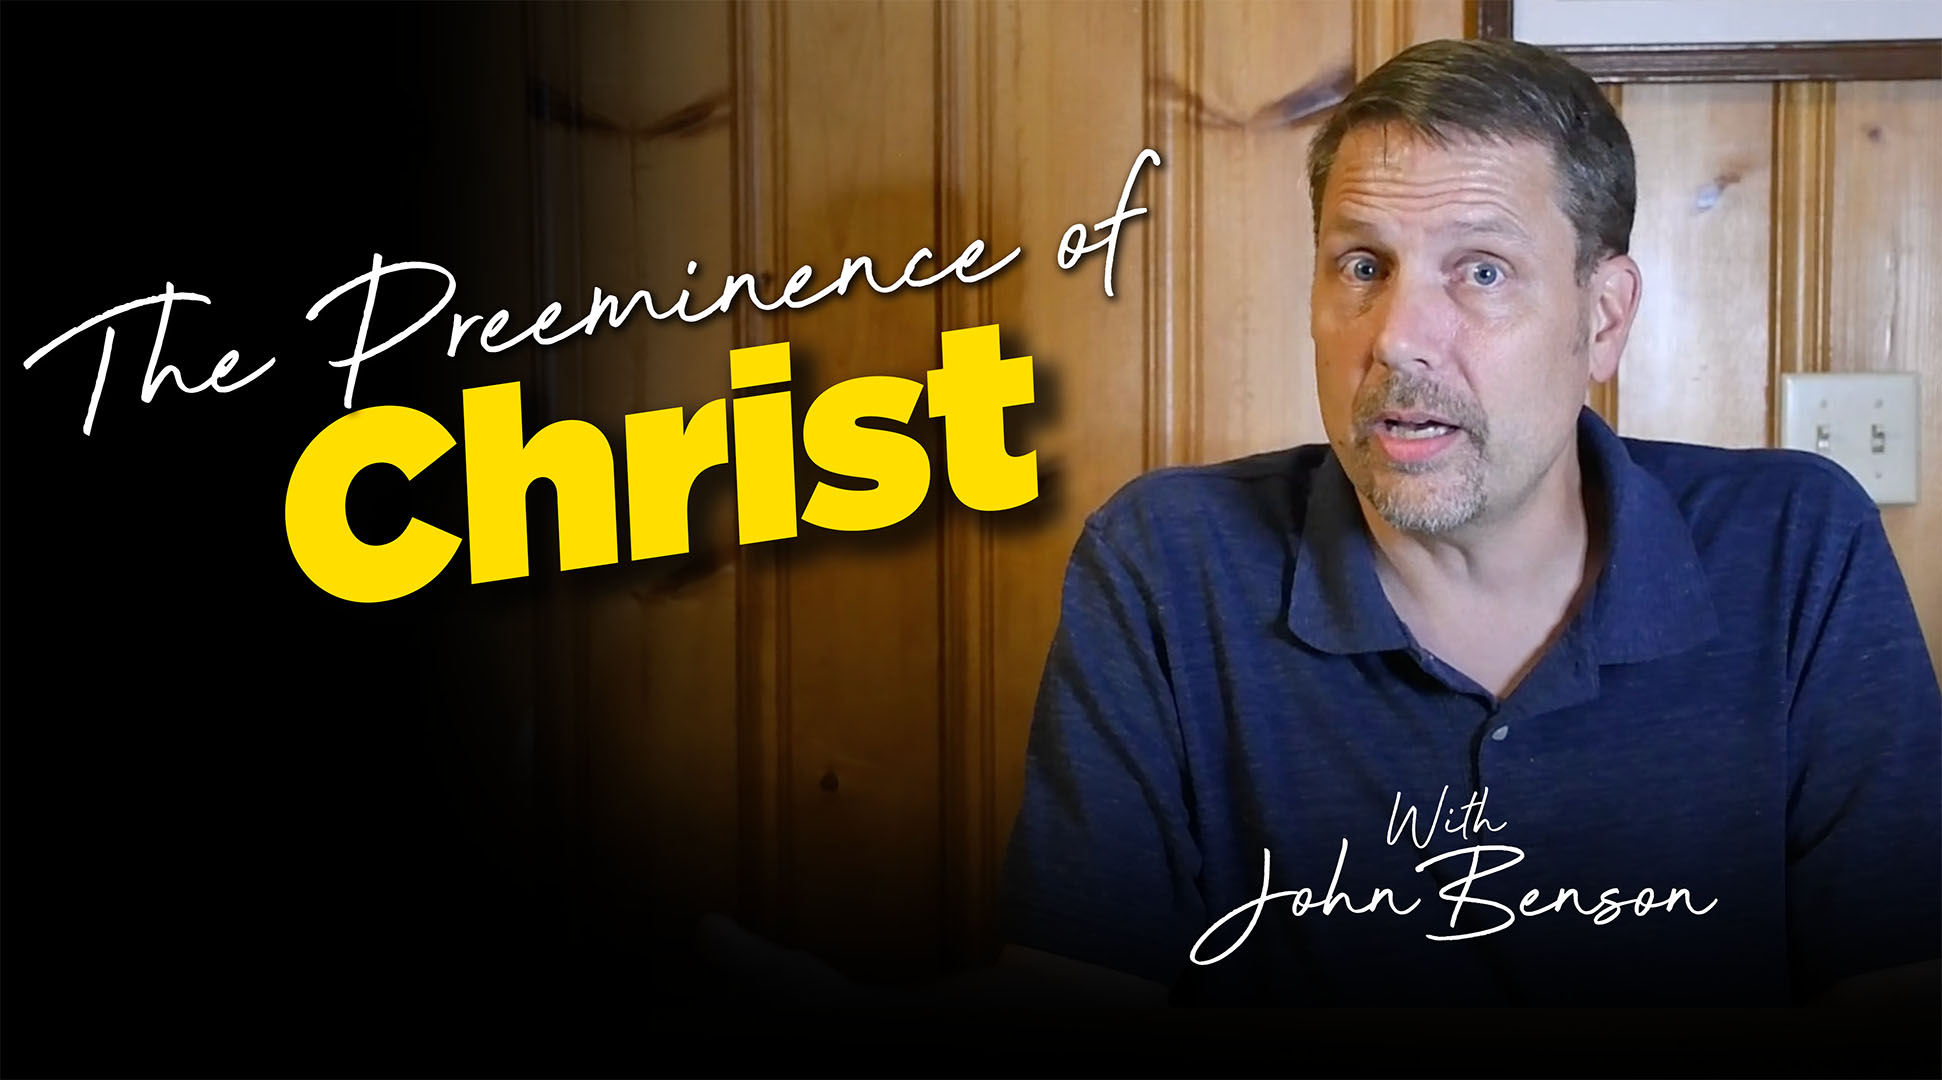 The Preeminence of Christ with John Benson